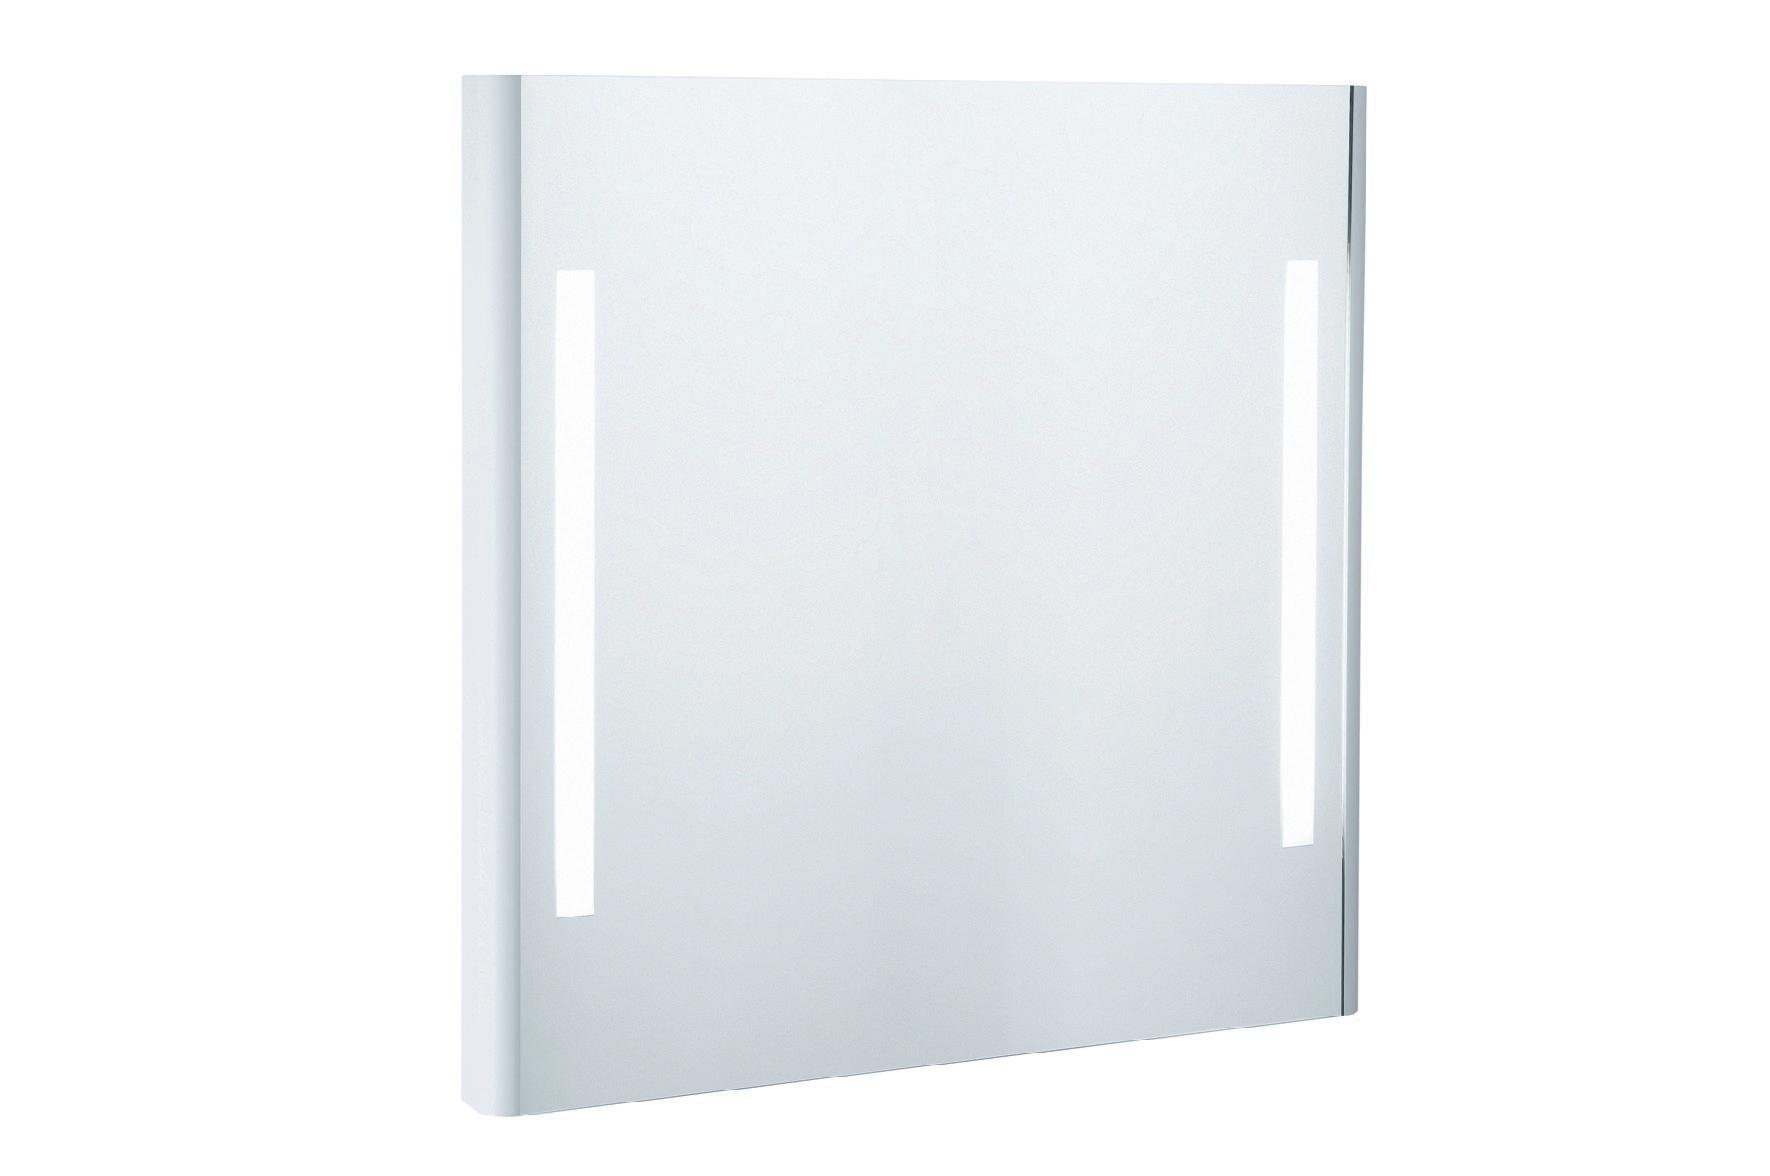 Oglinda cu lumini emma 80x80 cm - aqua - EMMA ROUNDED GALA - Poza 4